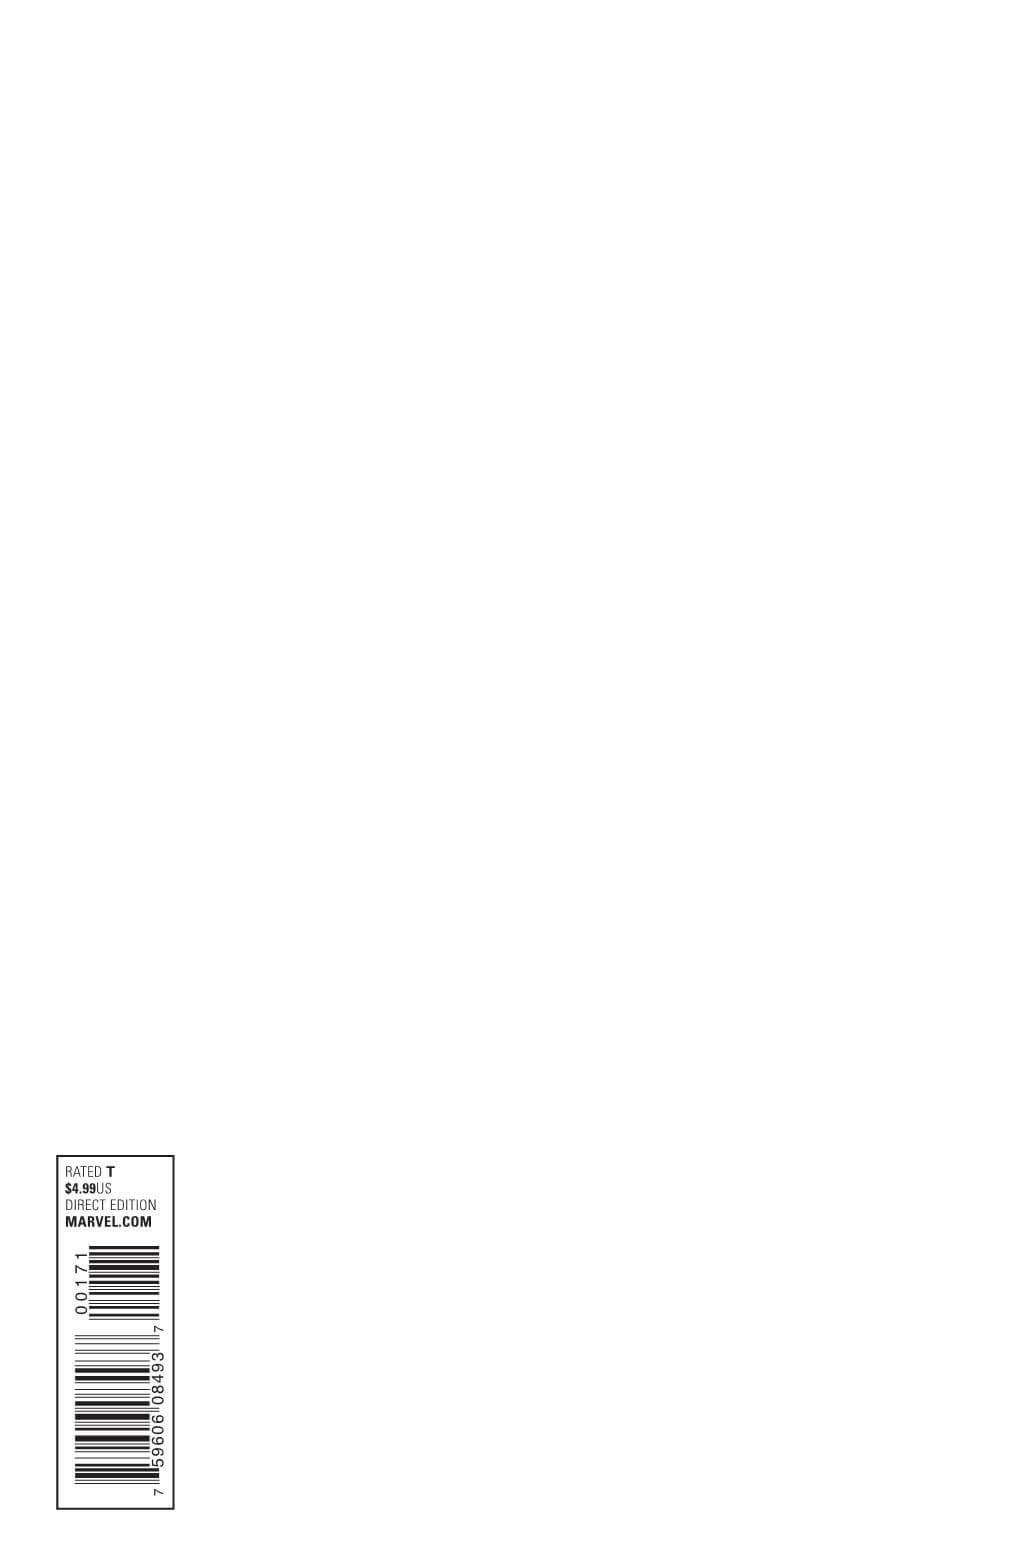 STWTFACOV2016001_DC71_2